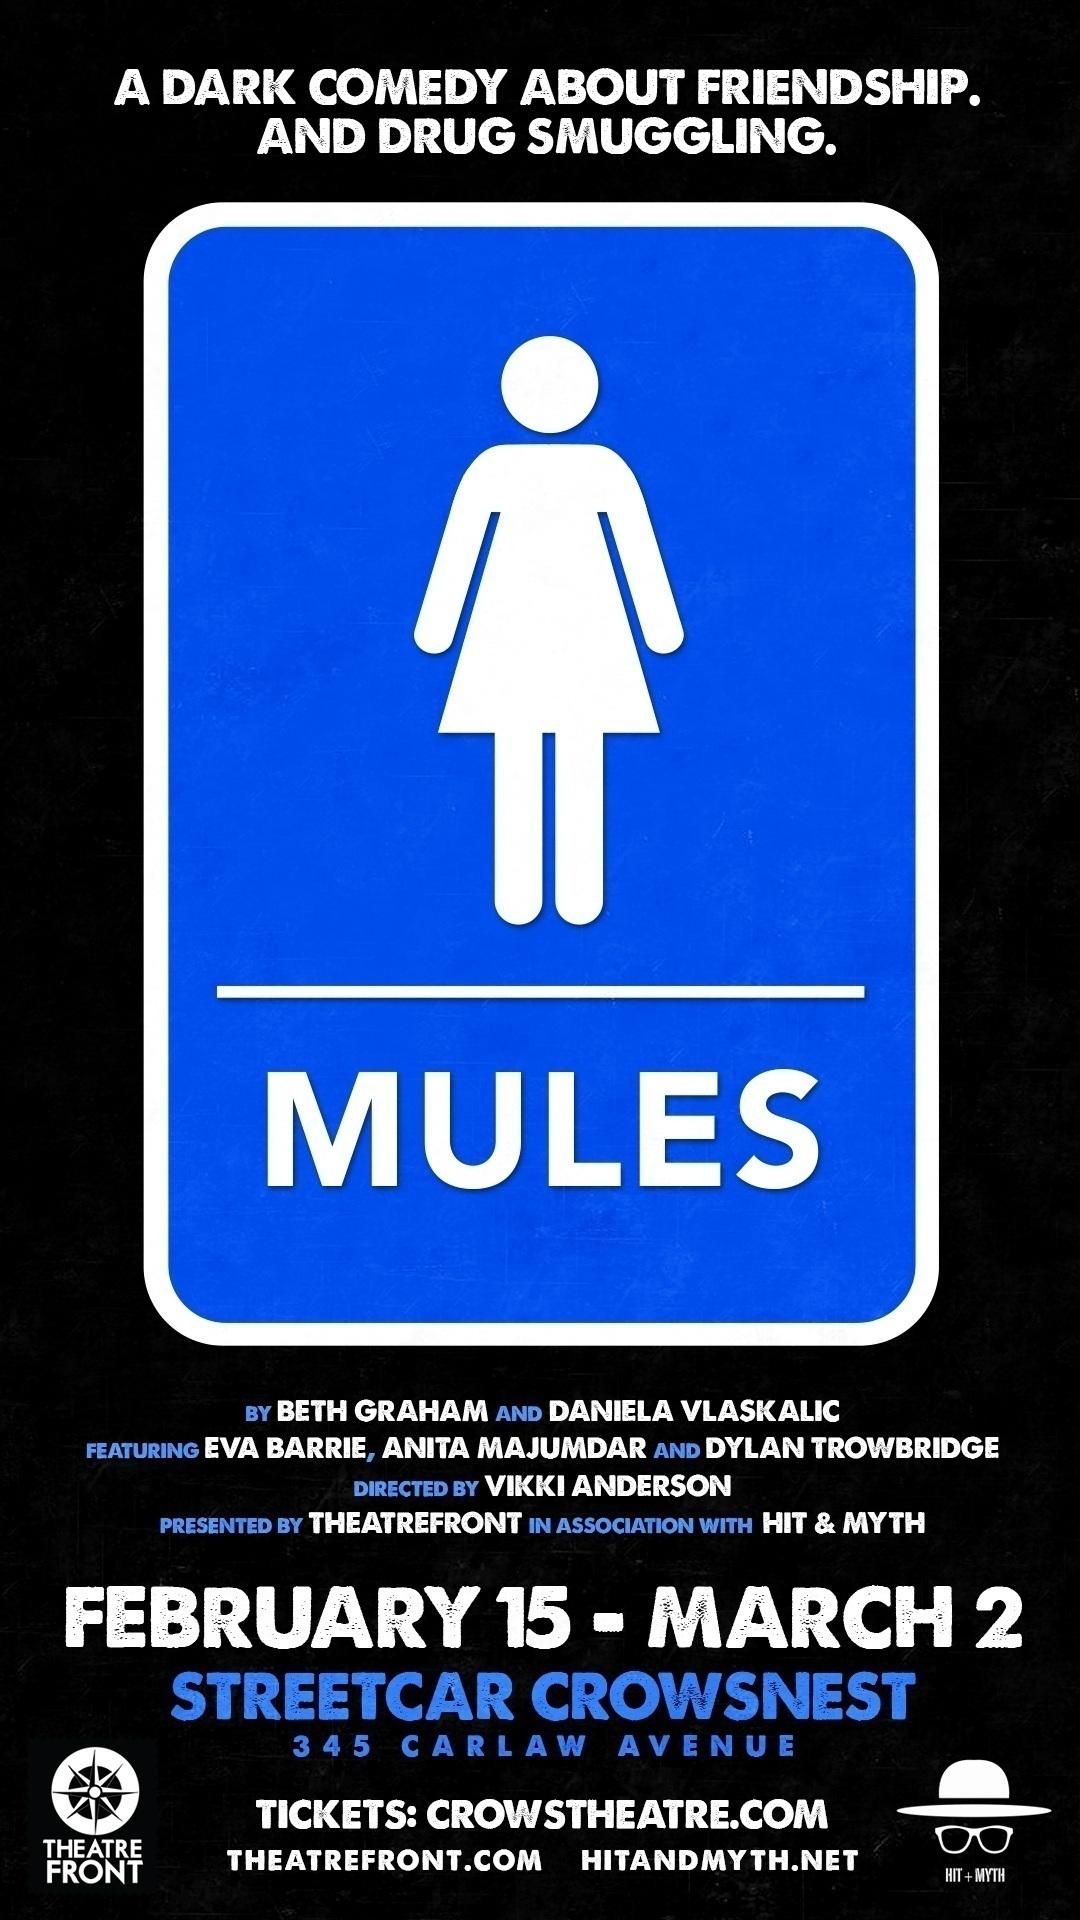 MULES_1080x1920_VERTICAL_MONITOR.jpg